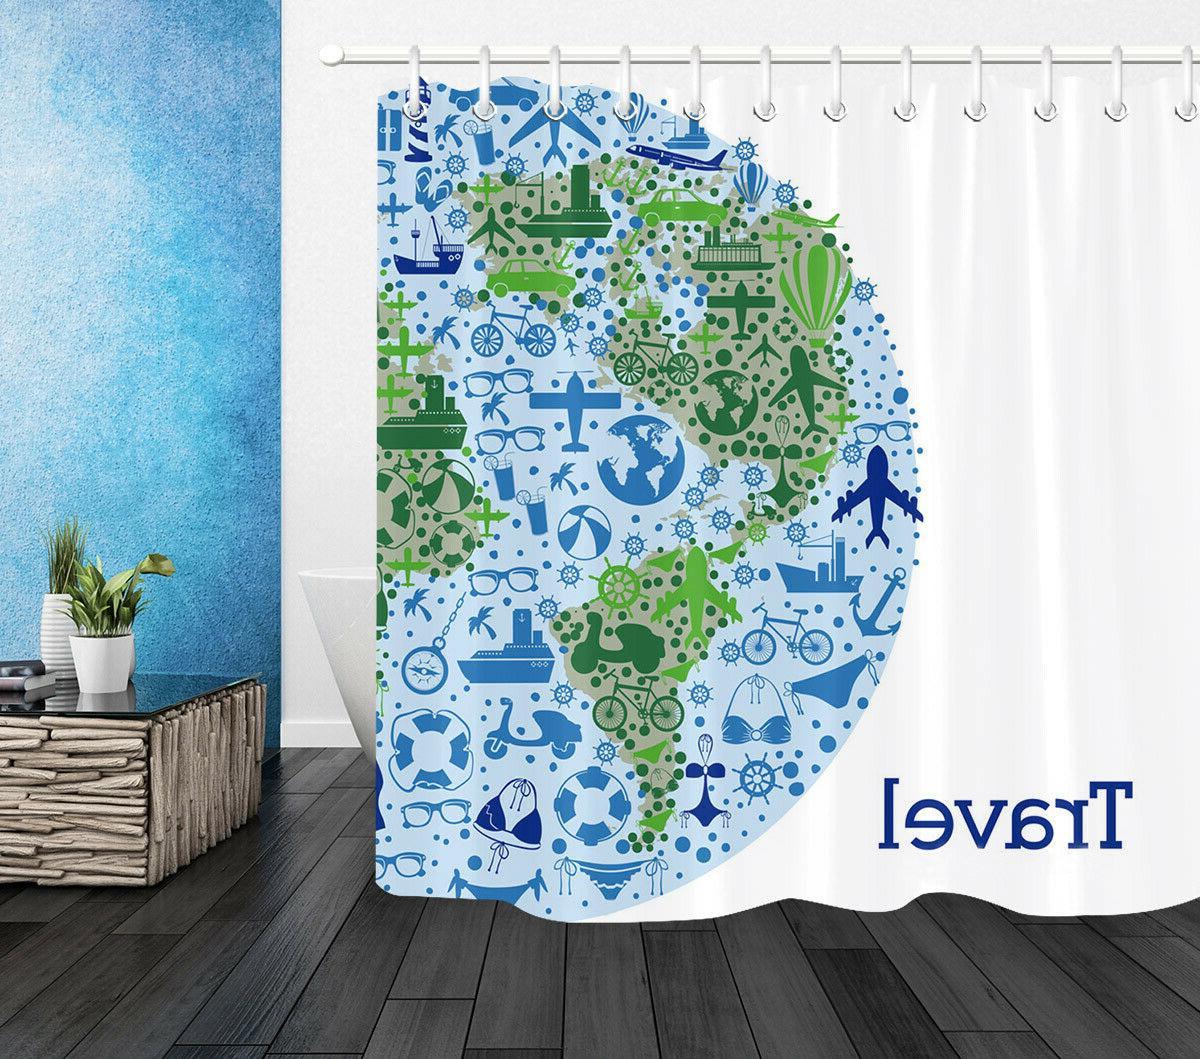 Travel Polyester Fabric Curtain Bath